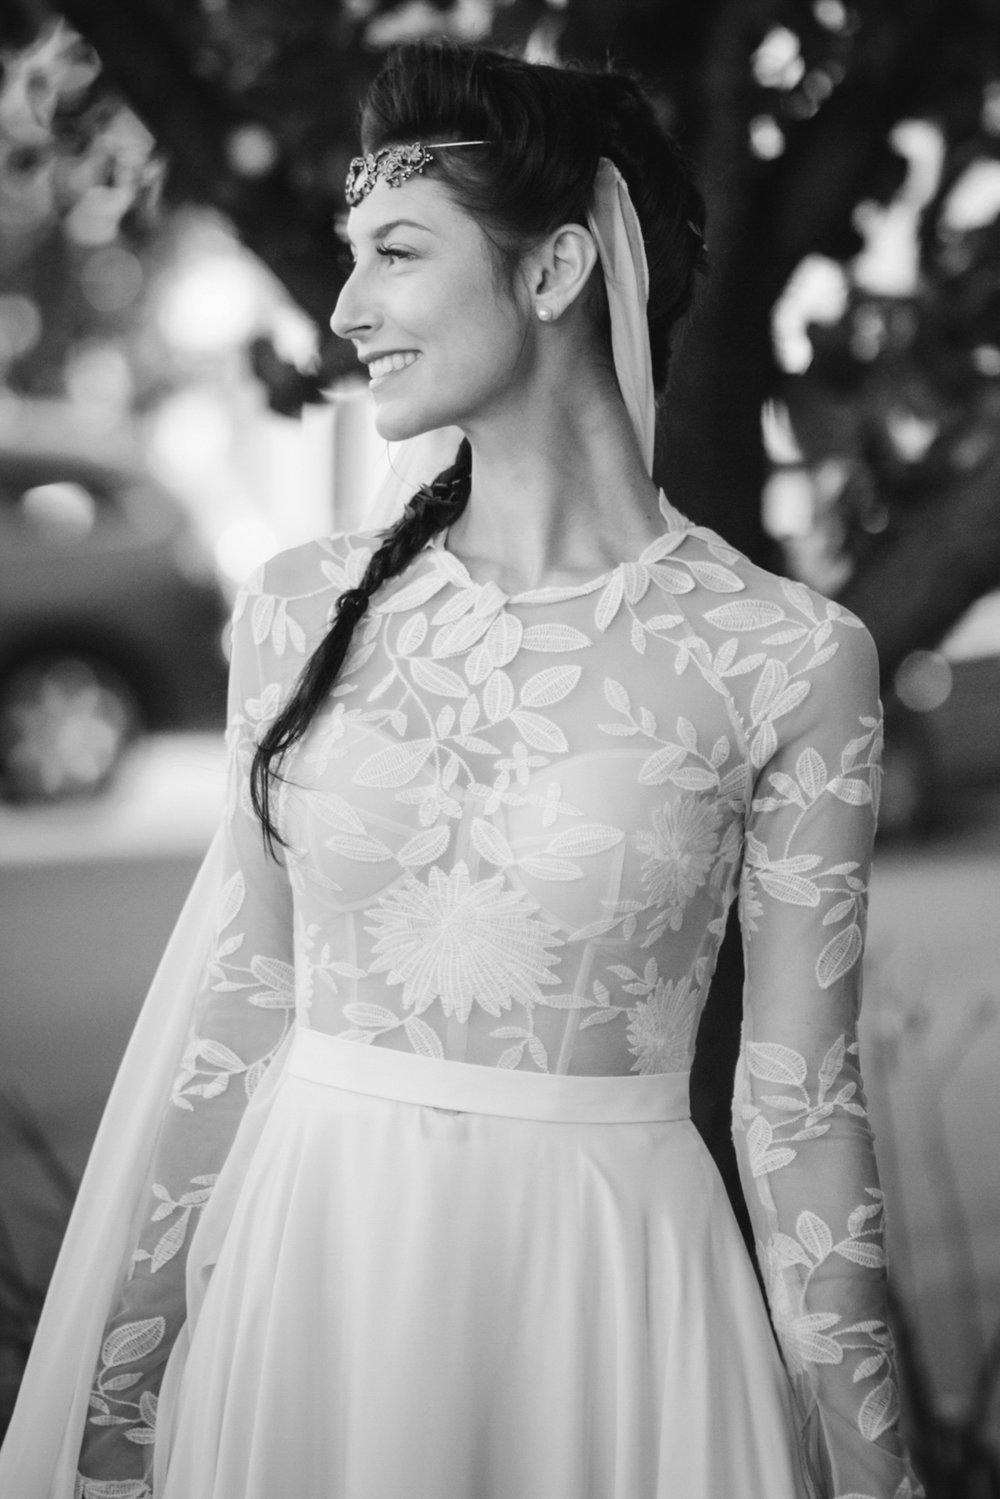 Kimberly-Coccagnia-Wedding-Photographer-149.JPG